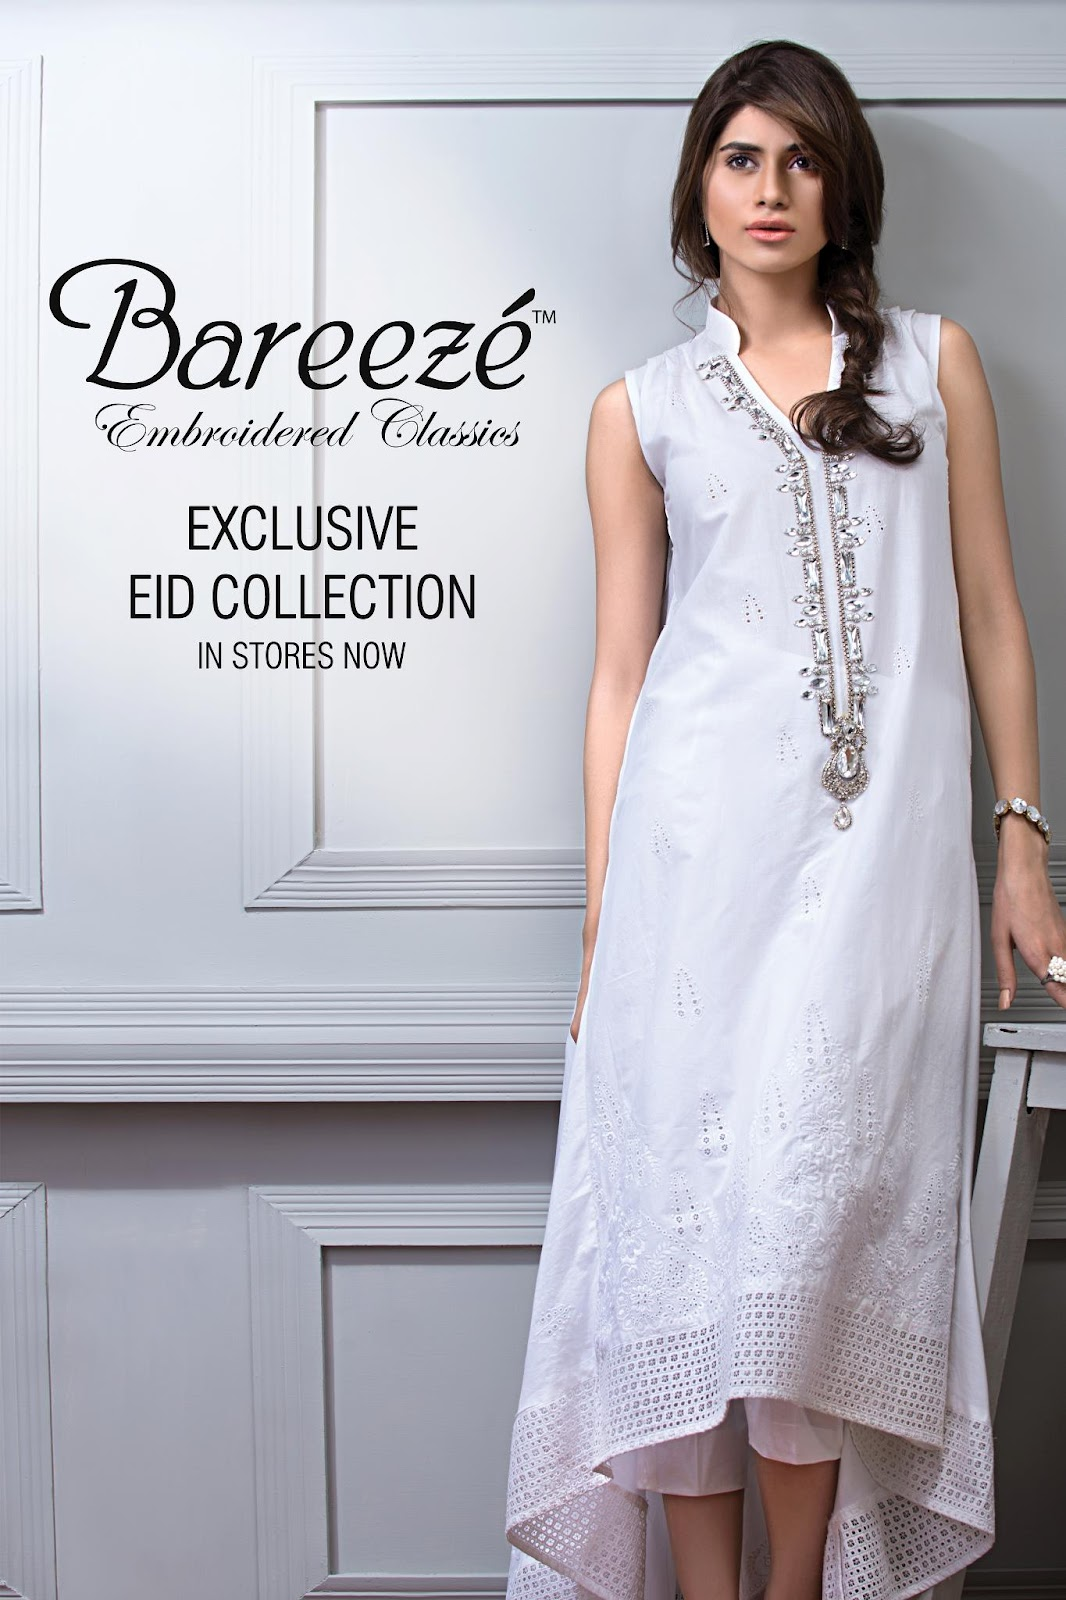 Bareeze live dresses gallery bareeze fashion brand photos designs - Bareeze Live Dresses Gallery Bareeze Fashion Brand Photos Designs 18